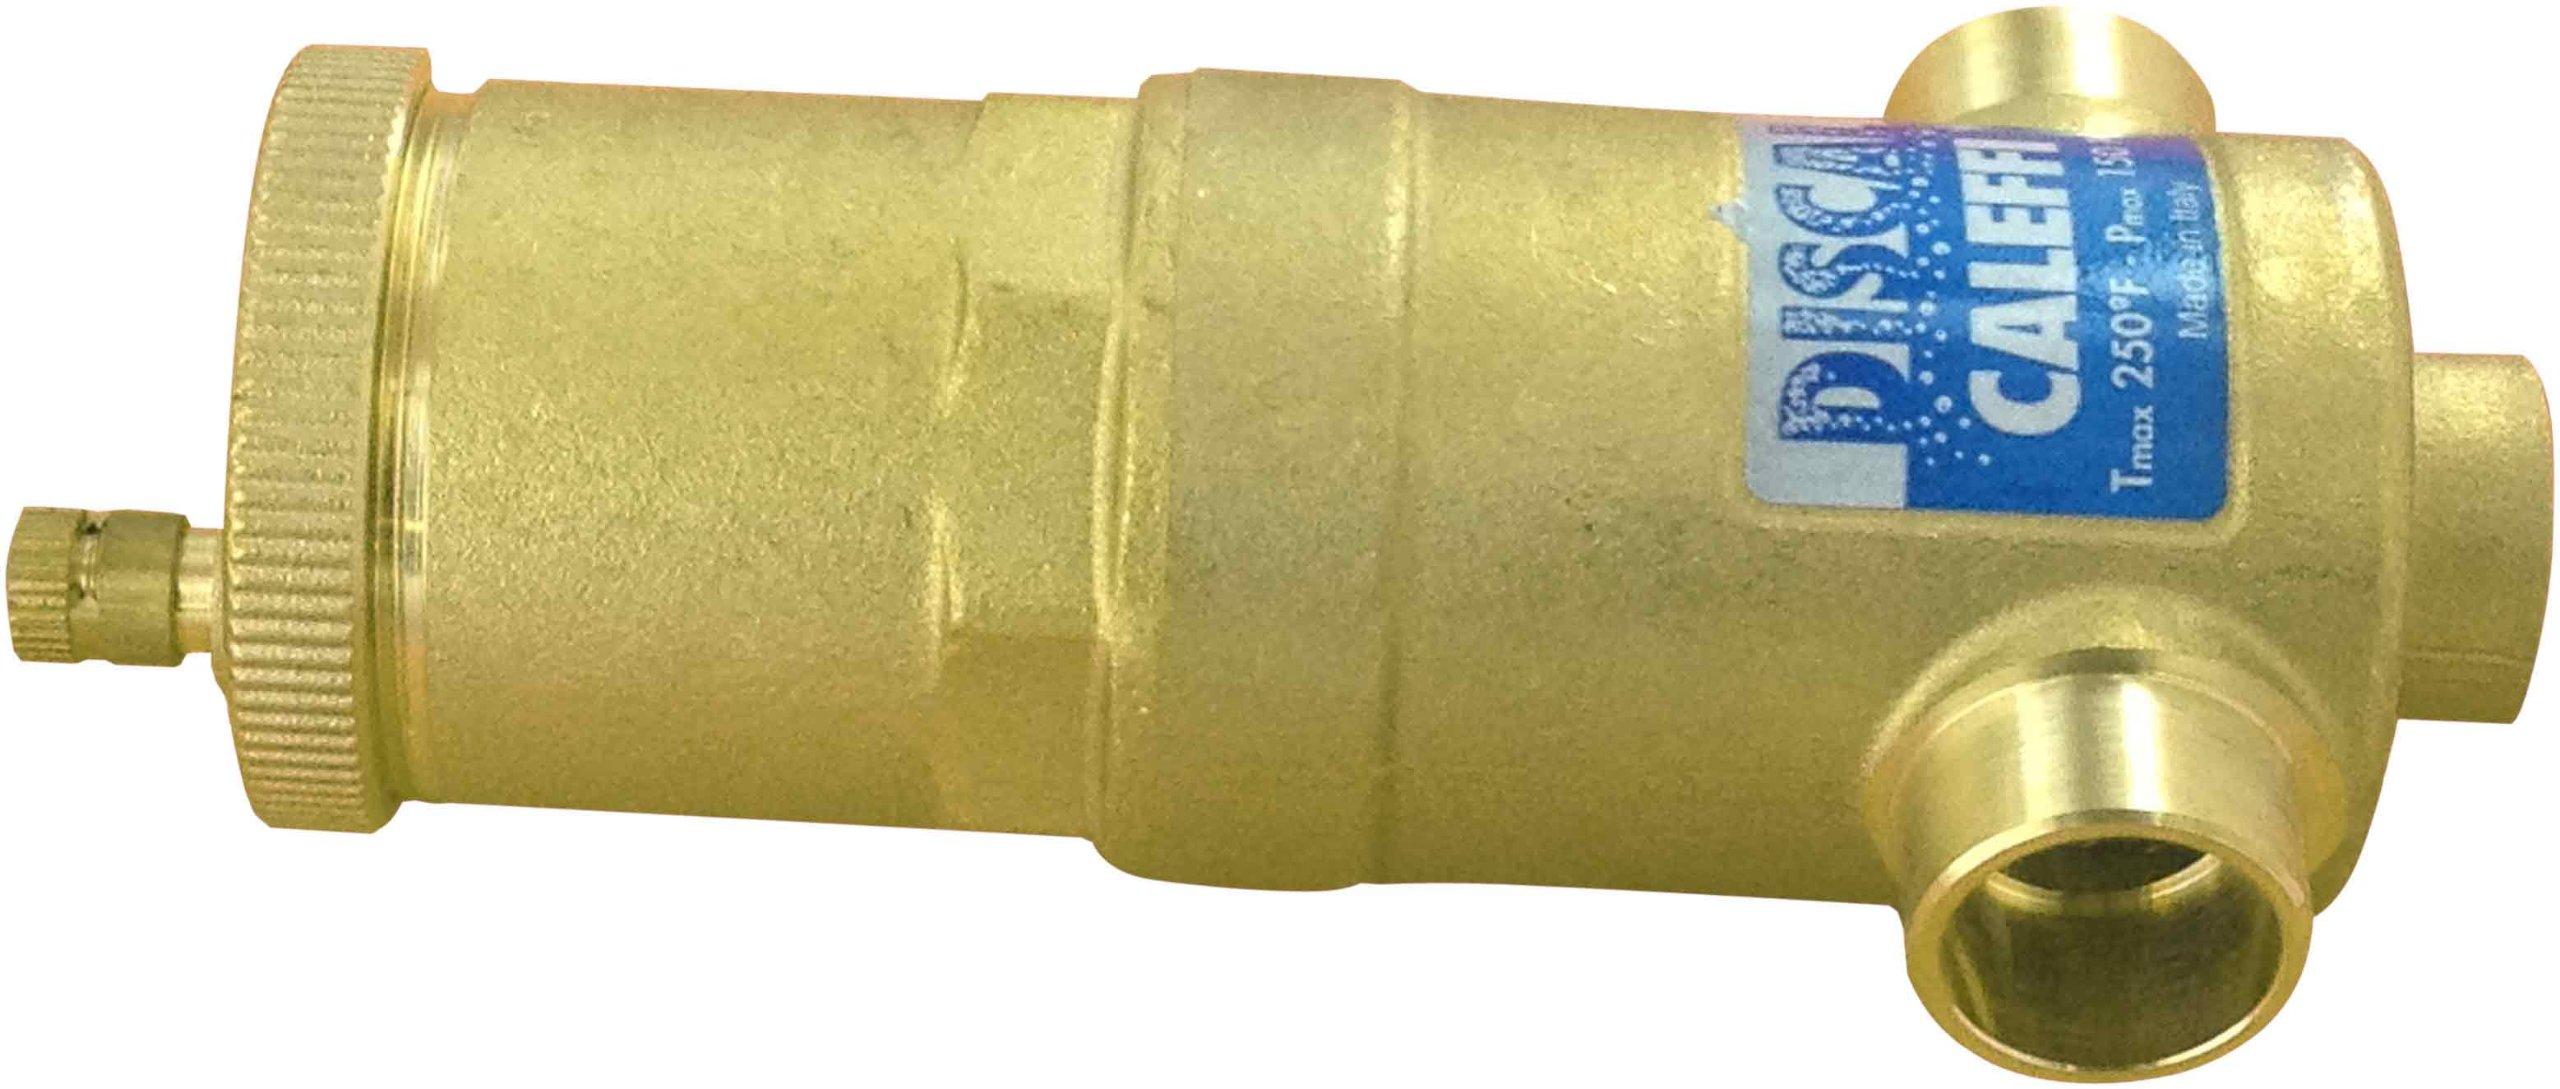 Caleffi 551022A 3/40-Inch 150 PSI Compact Brass Sweat Air Separator by Caleffi